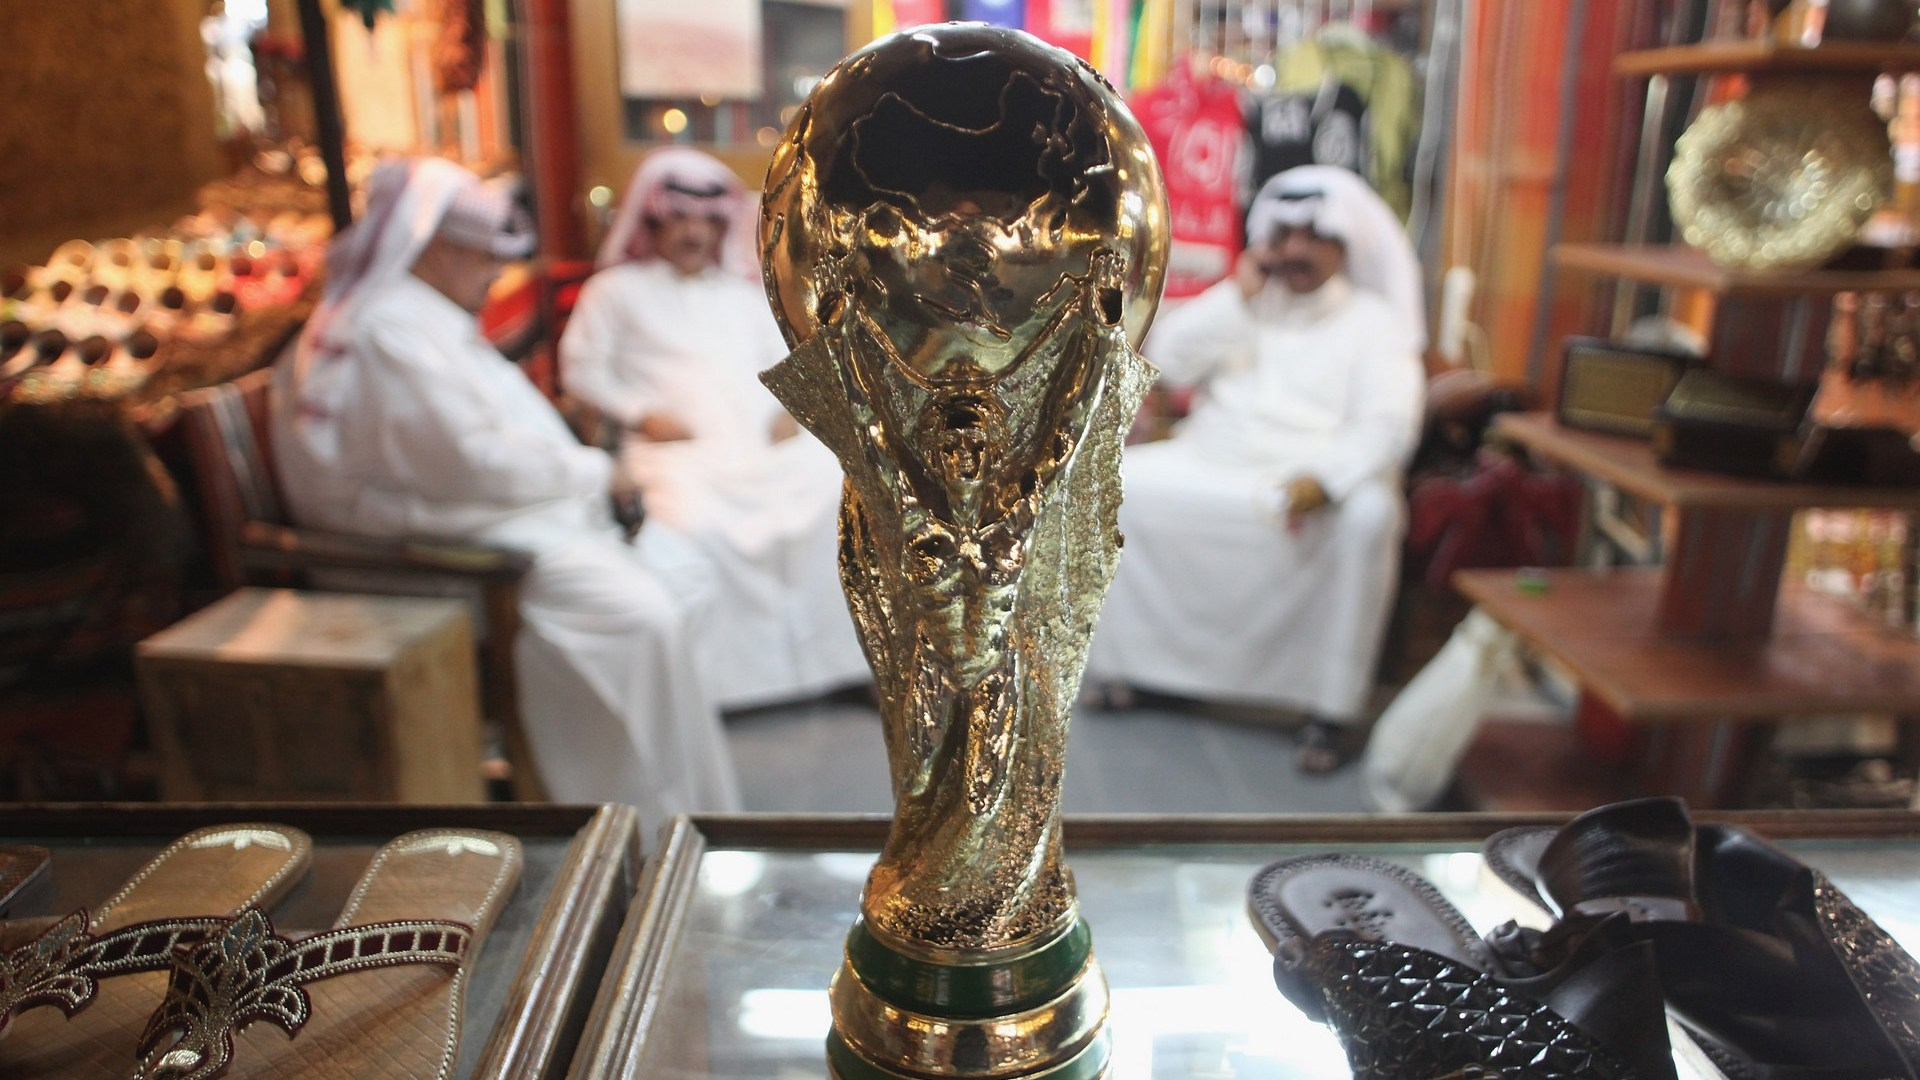 Copa do Mundo Catar 2022